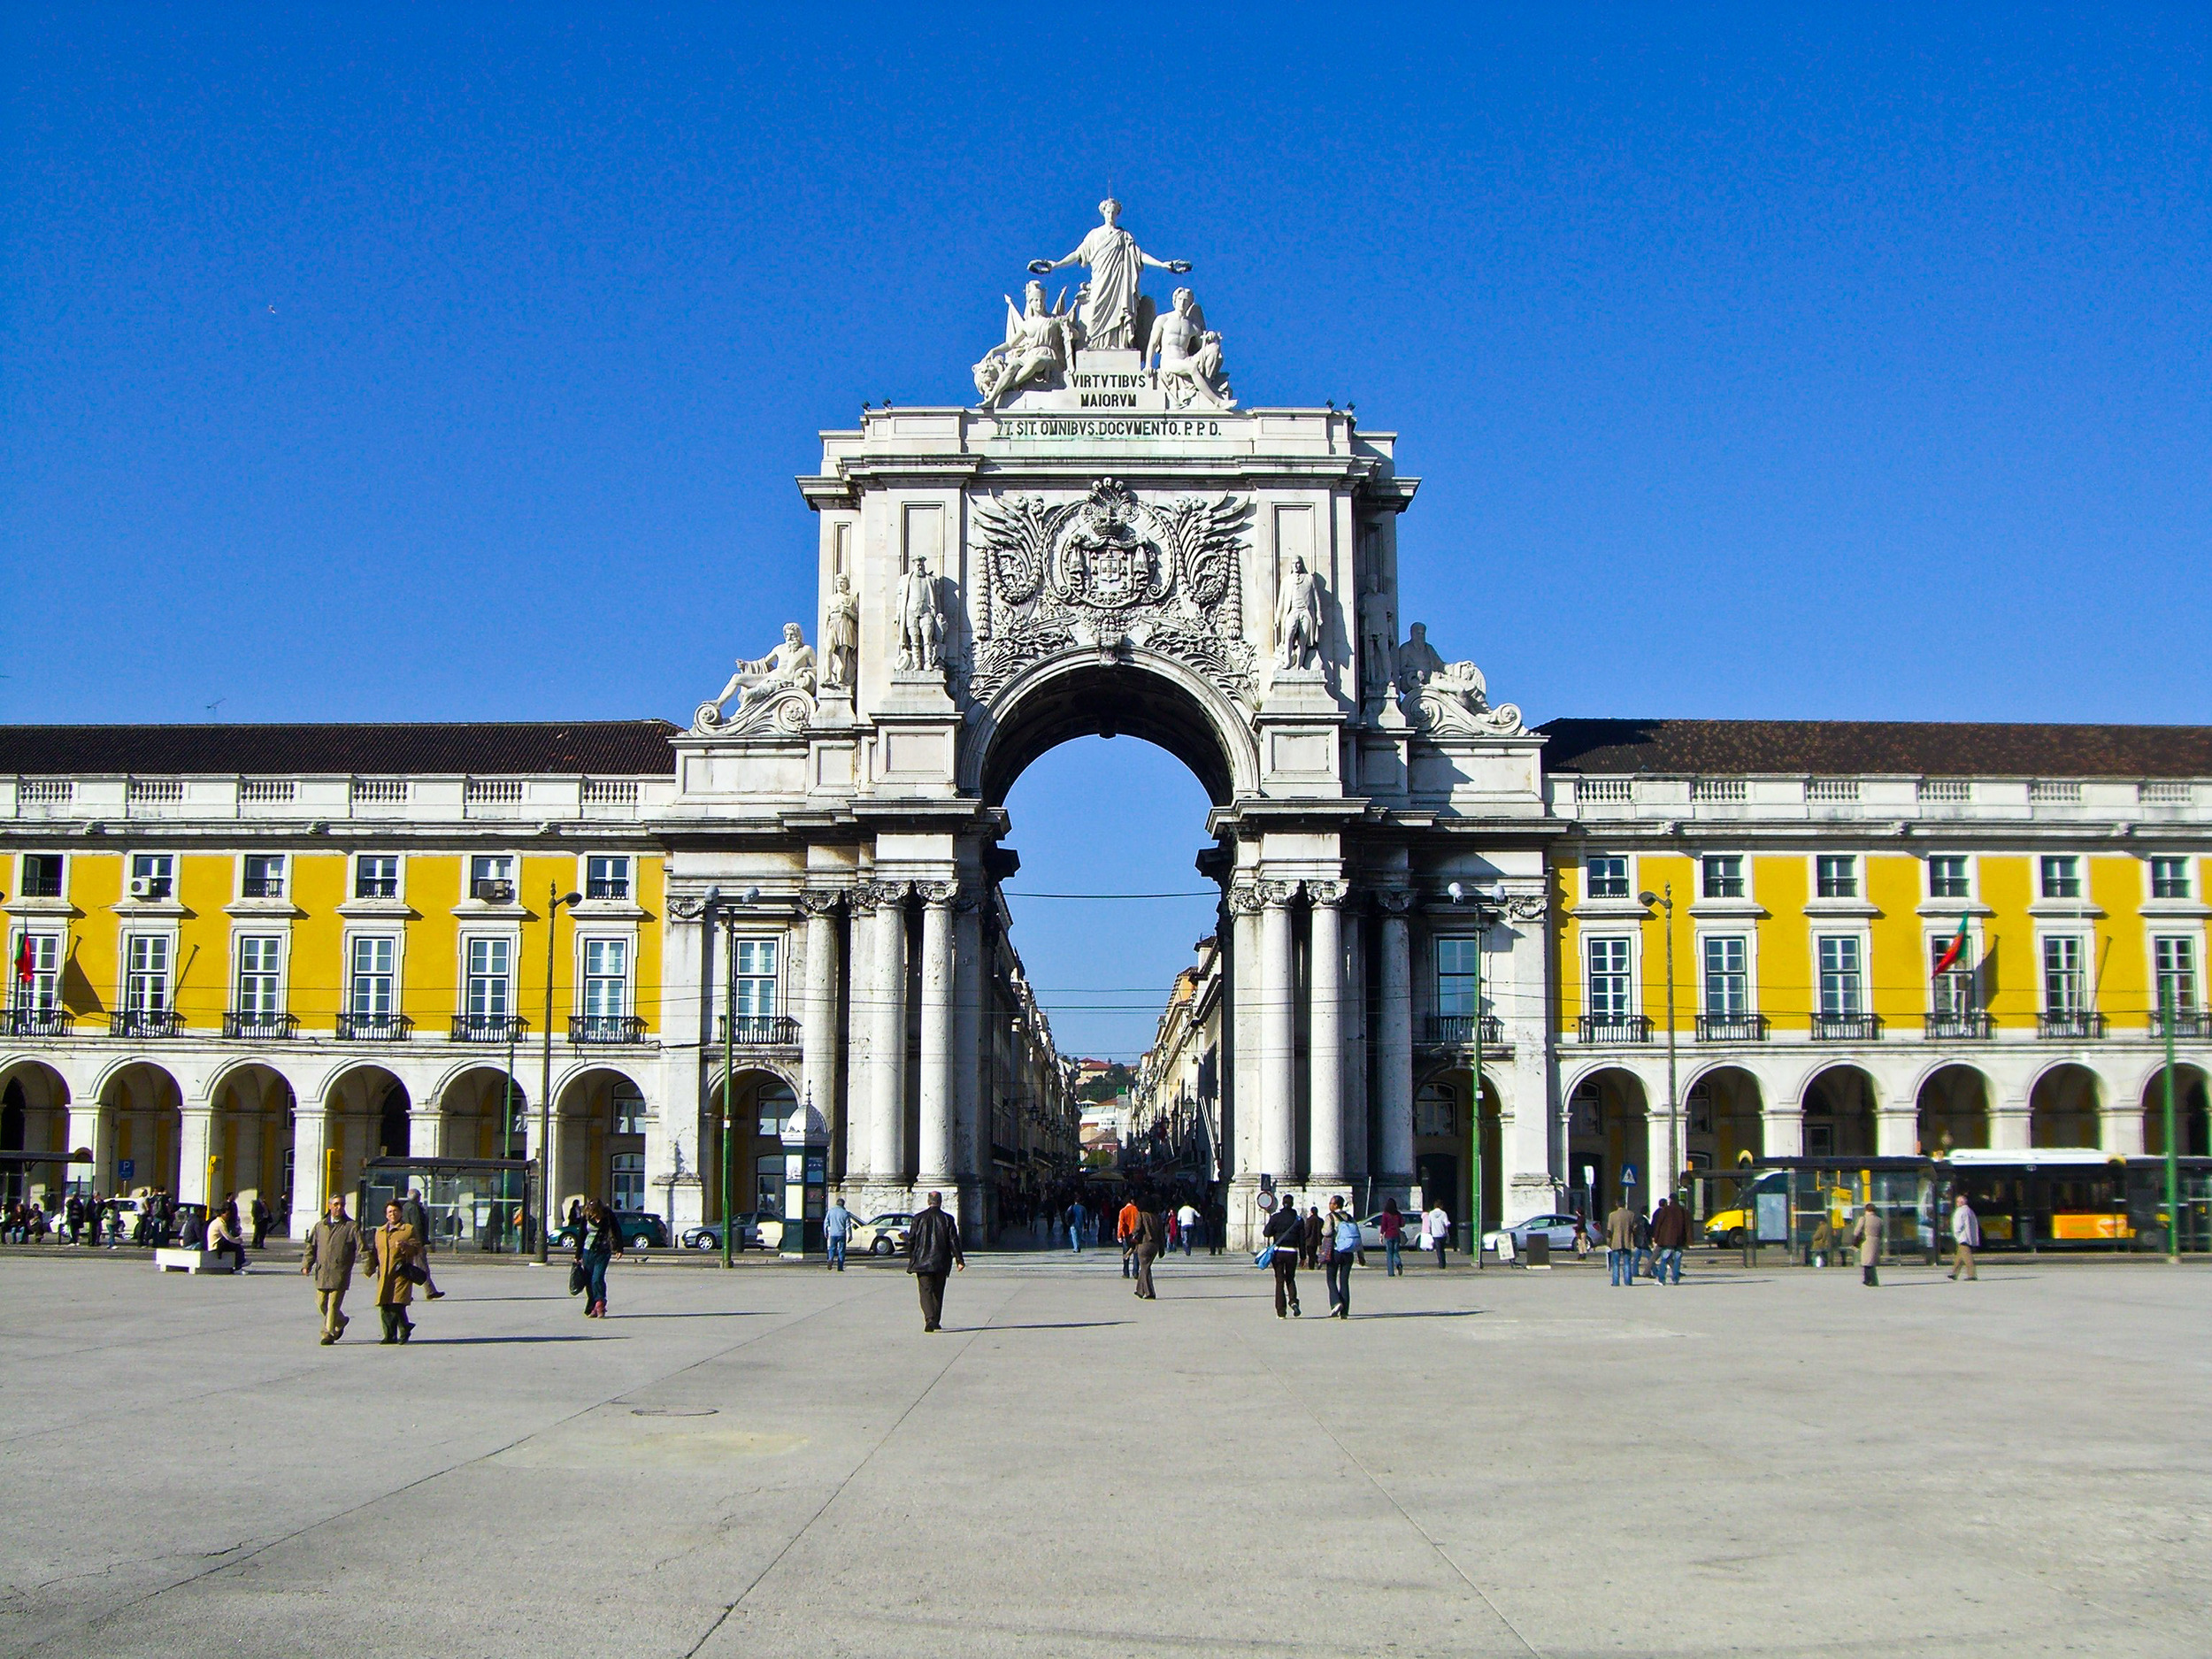 La Praça do Commercial en el centro de Lisboa